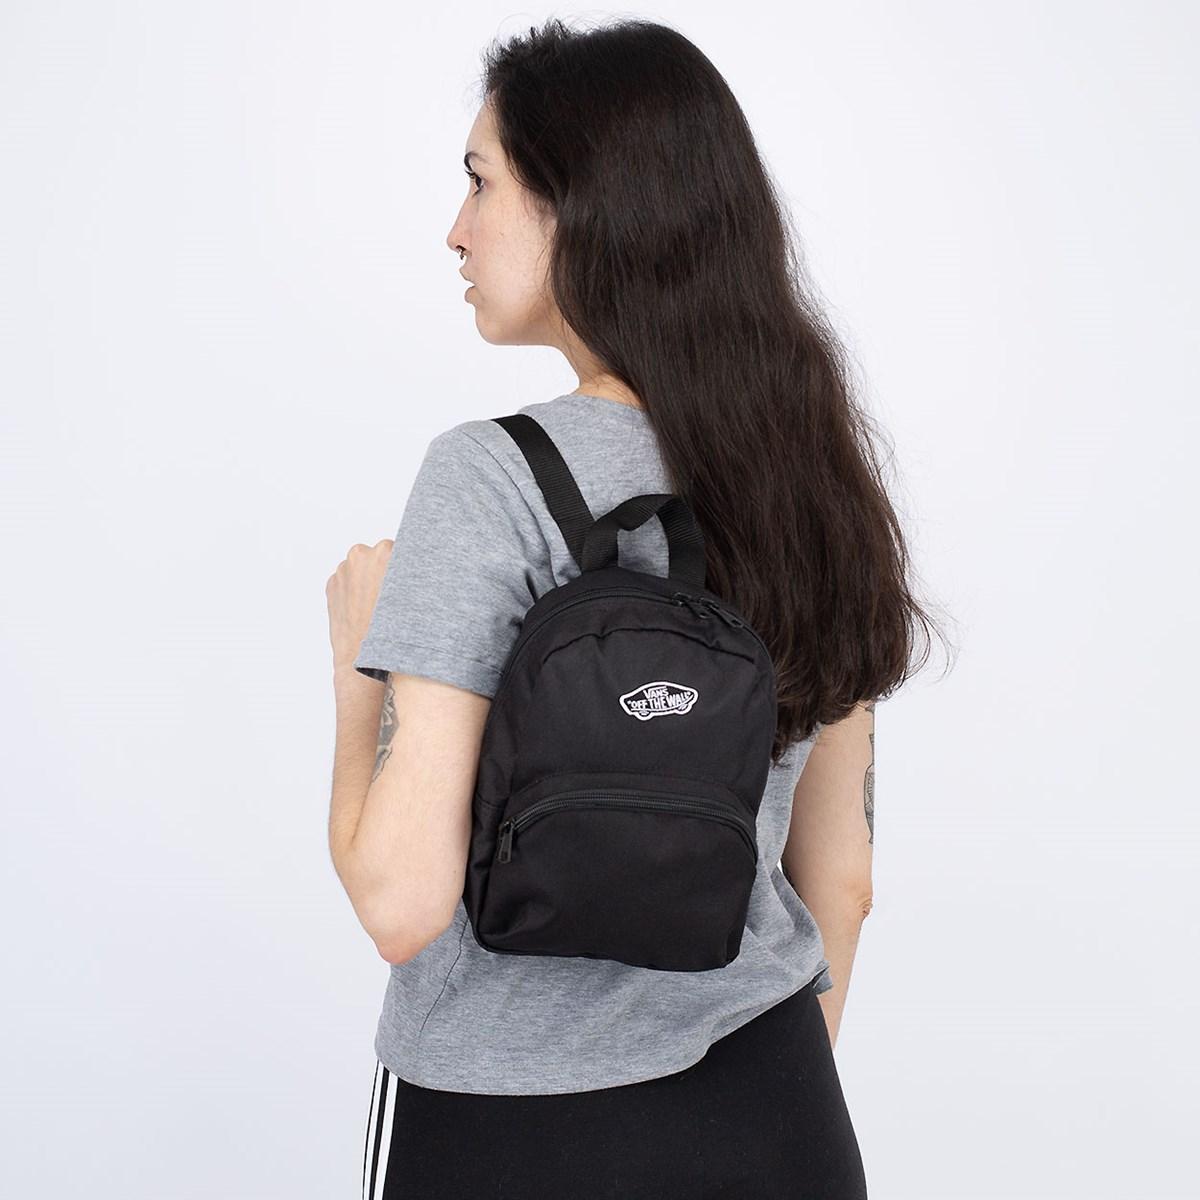 Mochila Vans Got This Mini Backpack Black VN0A3Z7WBLK